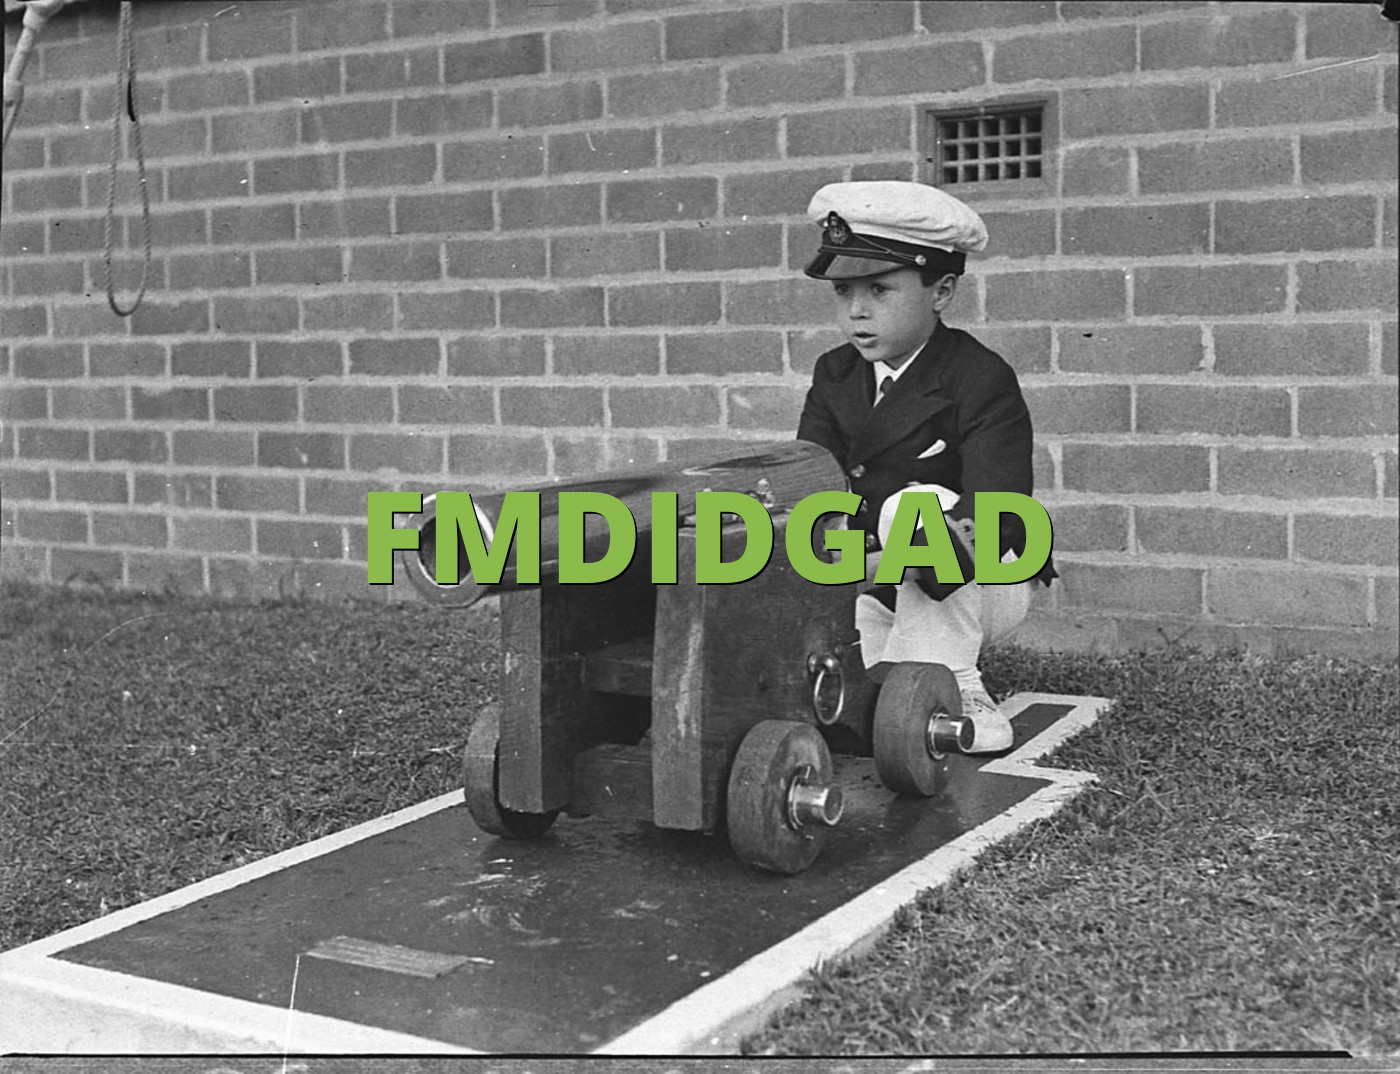 FMDIDGAD